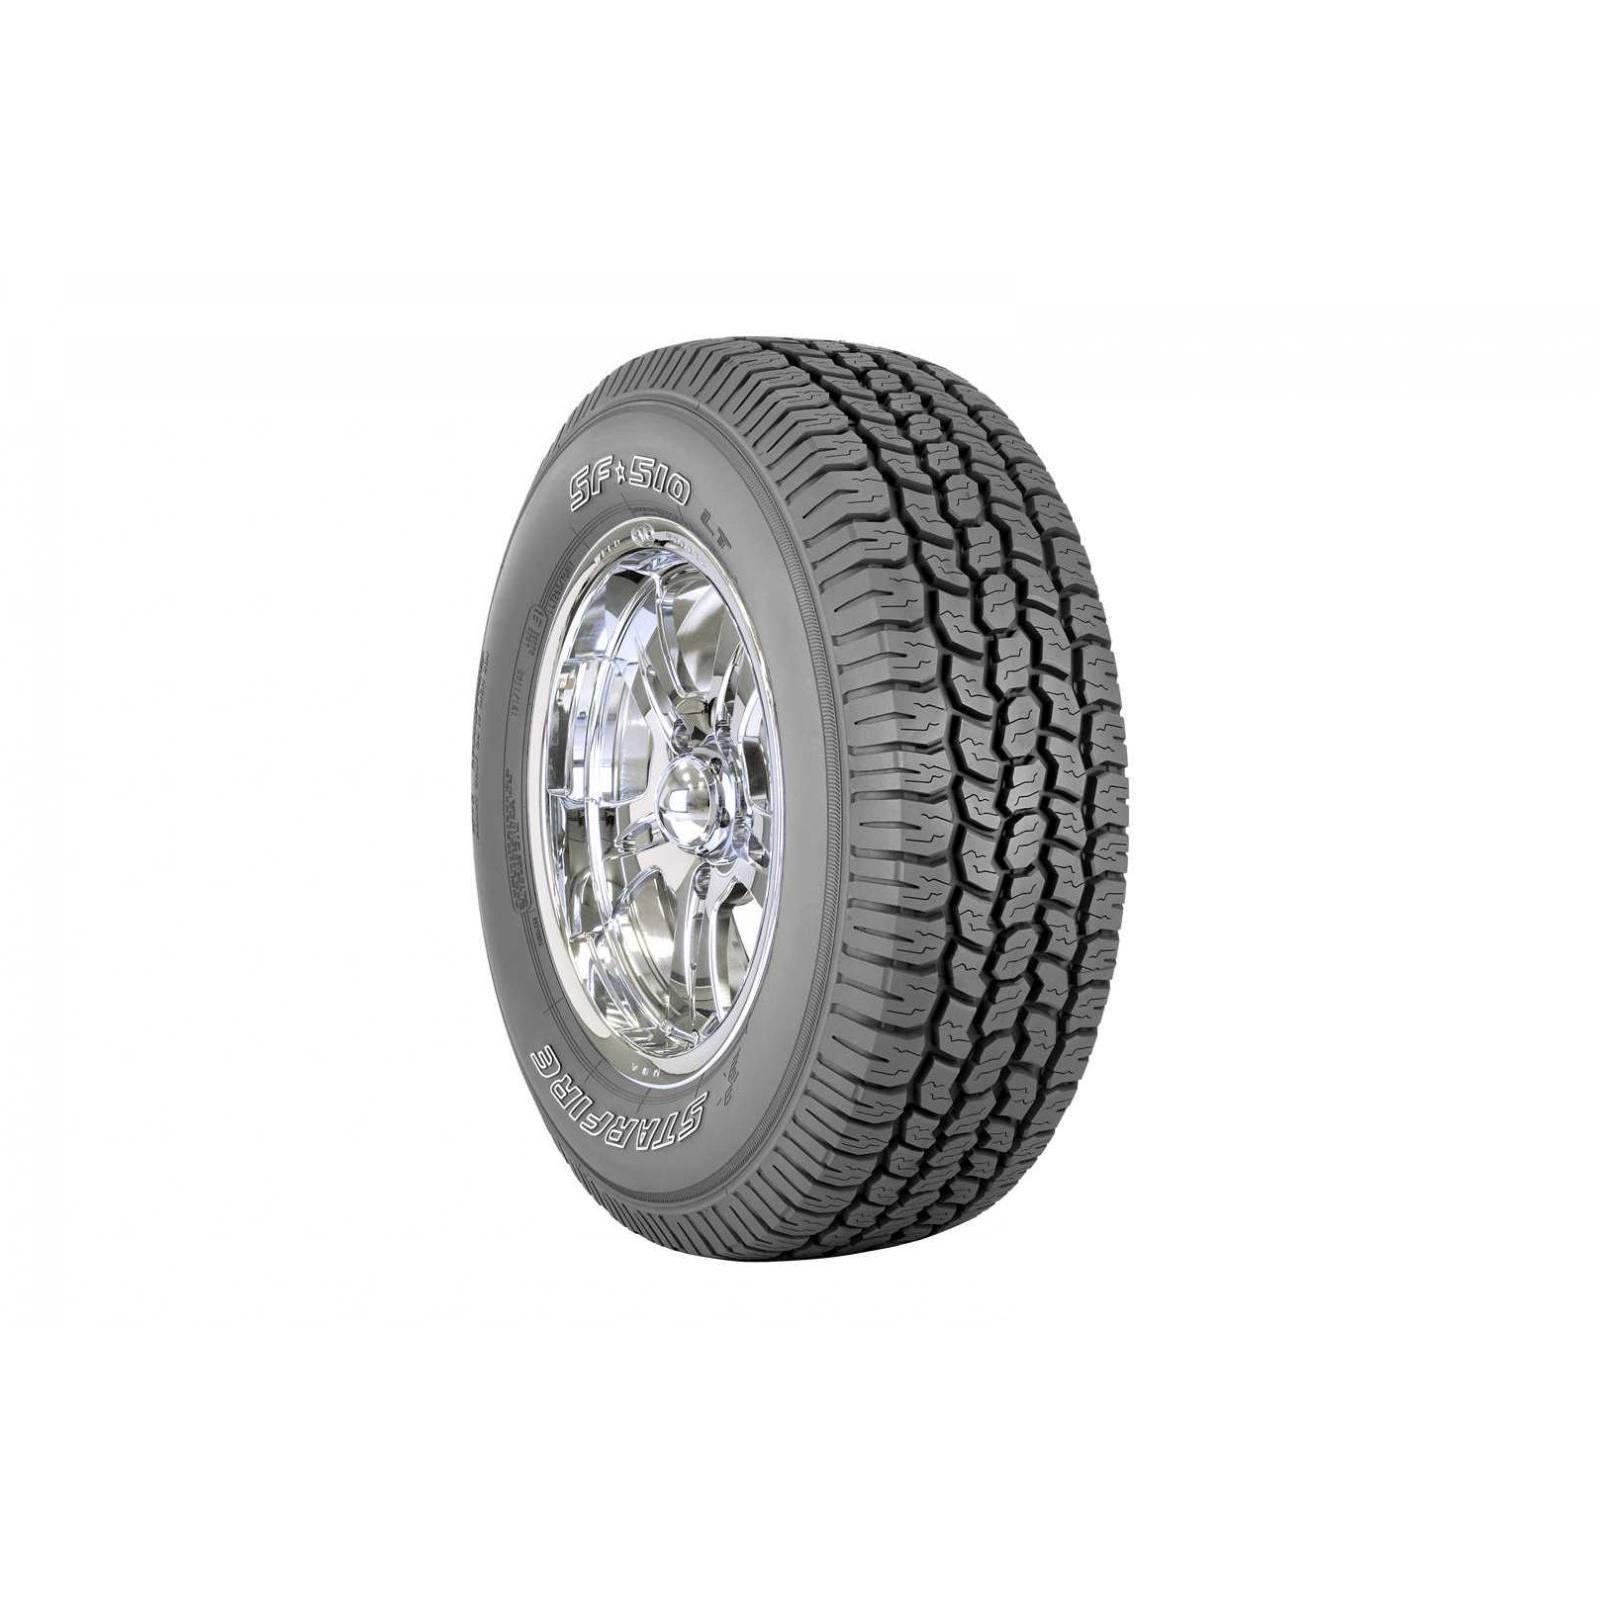 Starfire SF-510 All Season Tire - 245/65R17 107S (Black)